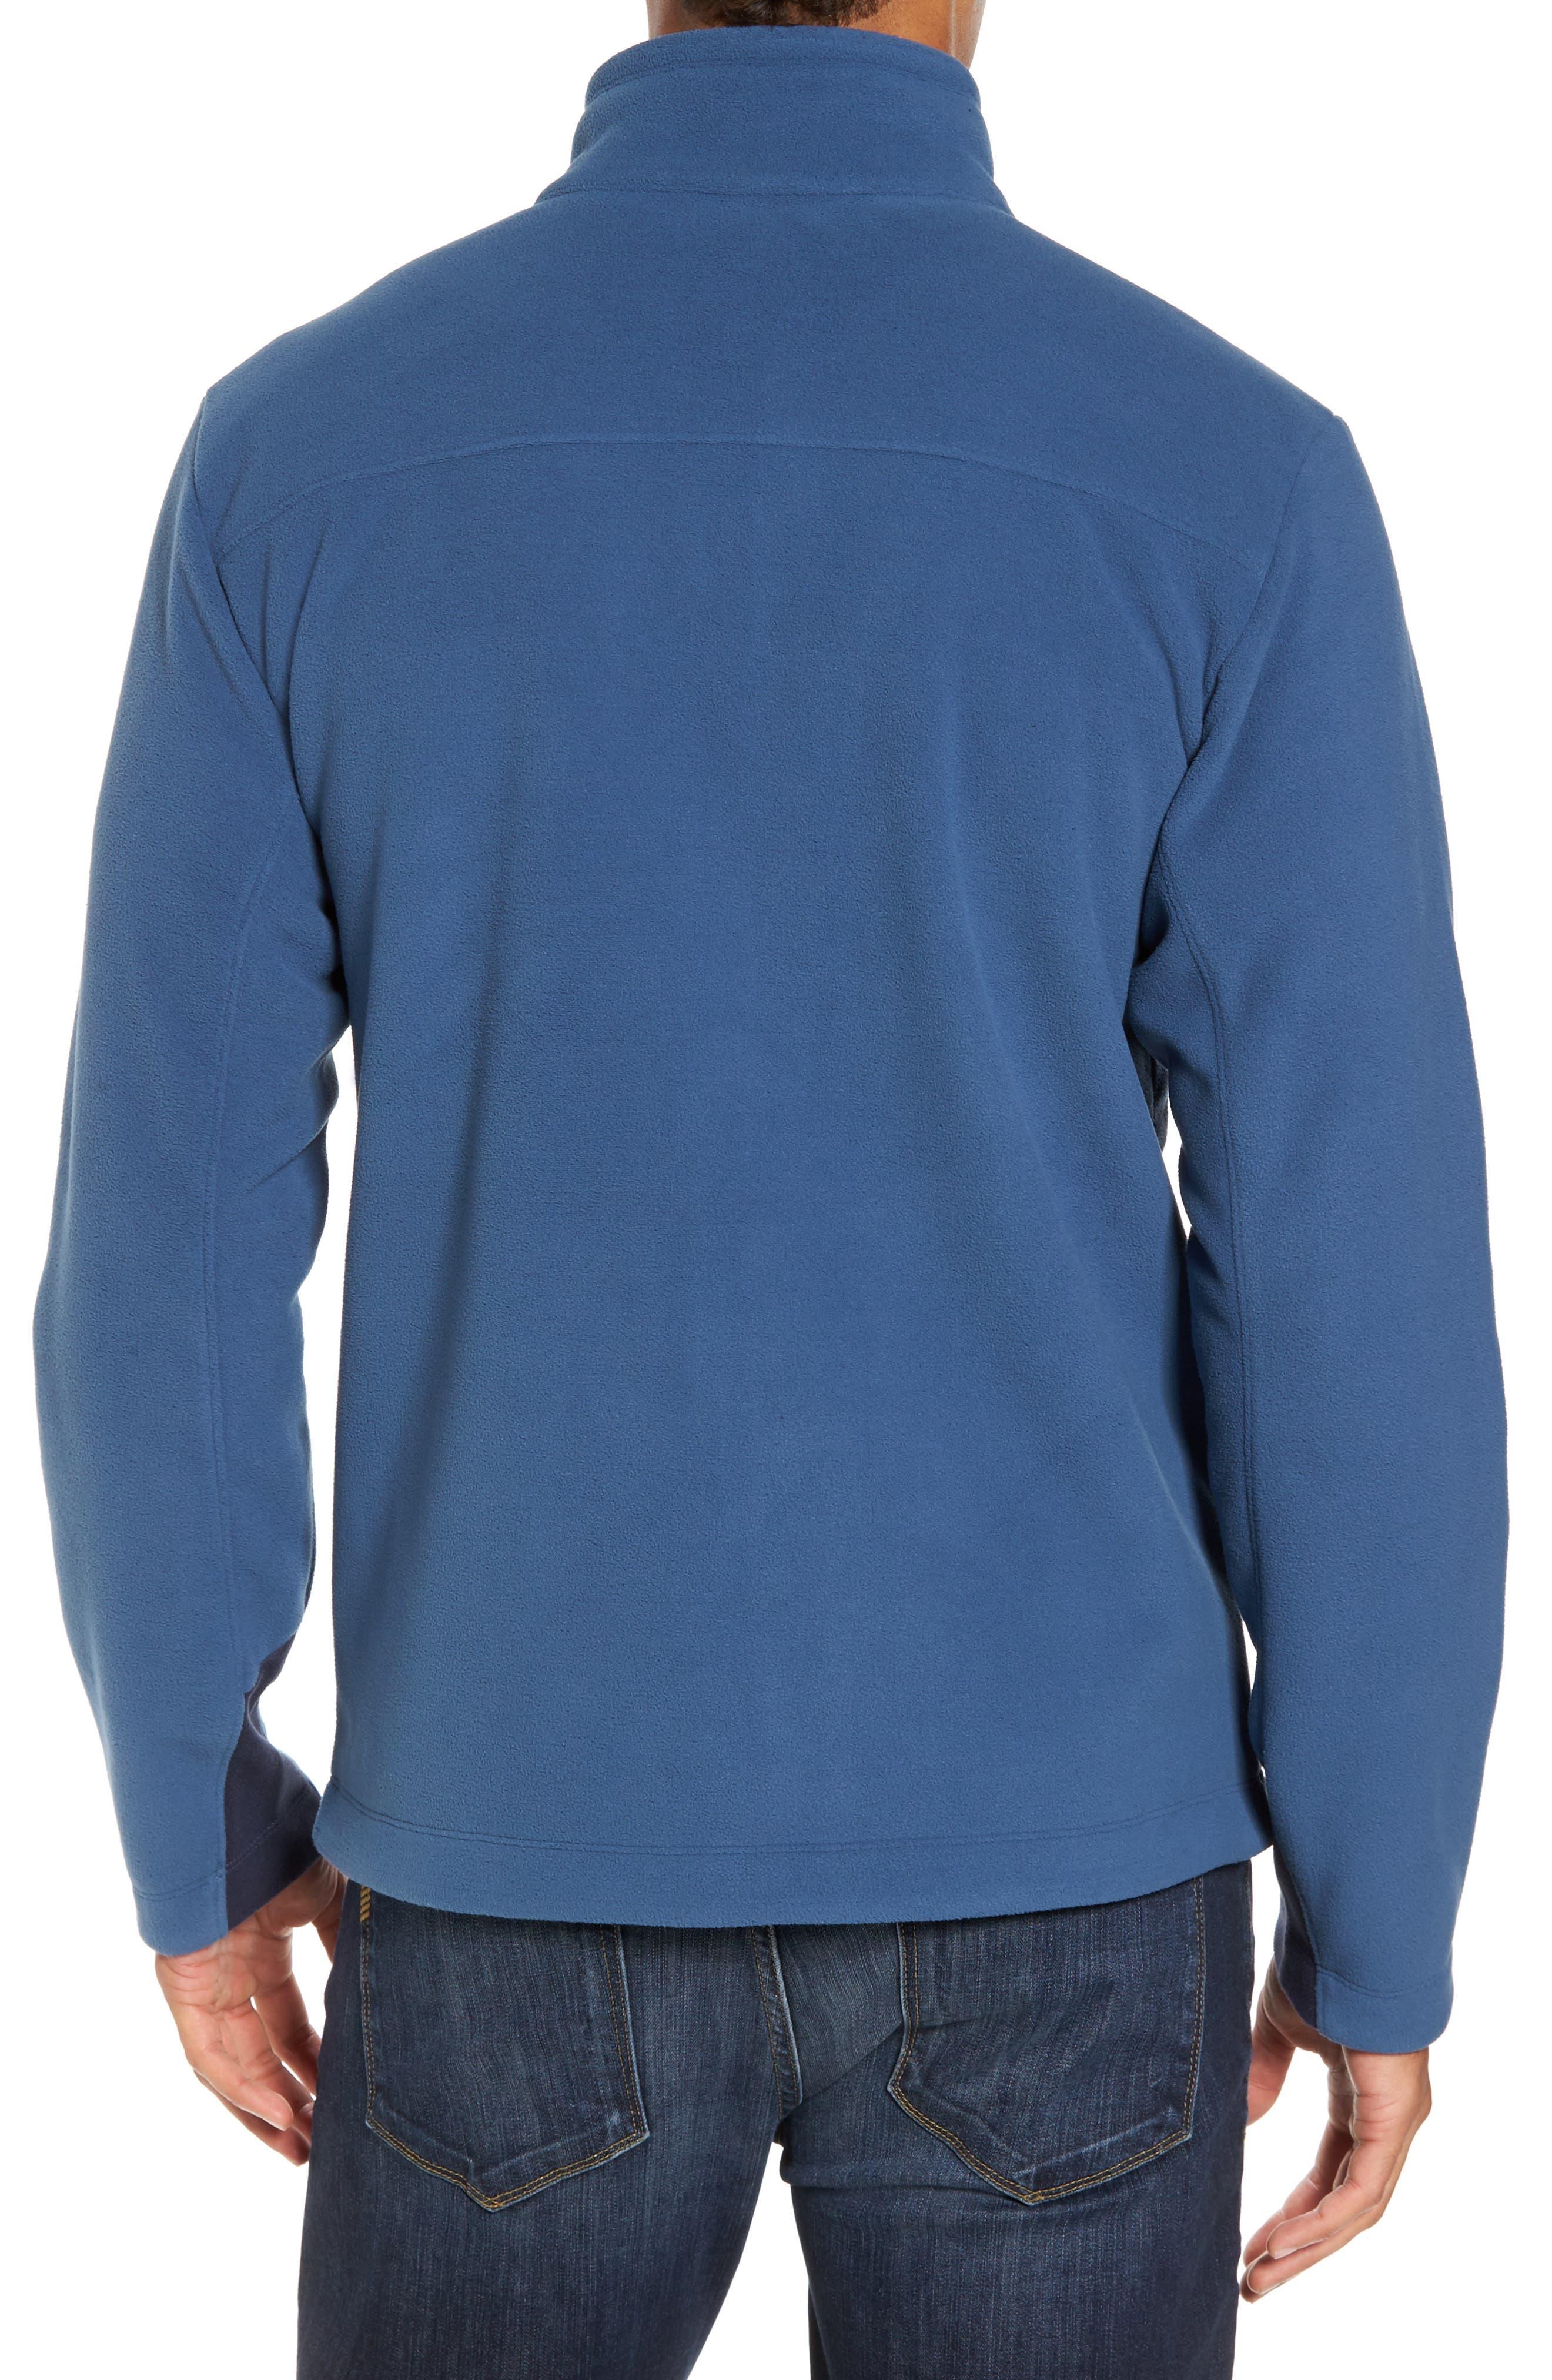 Alternate Image 2  - The North Face 'Chimborazo' Zip Front Fleece Jacket